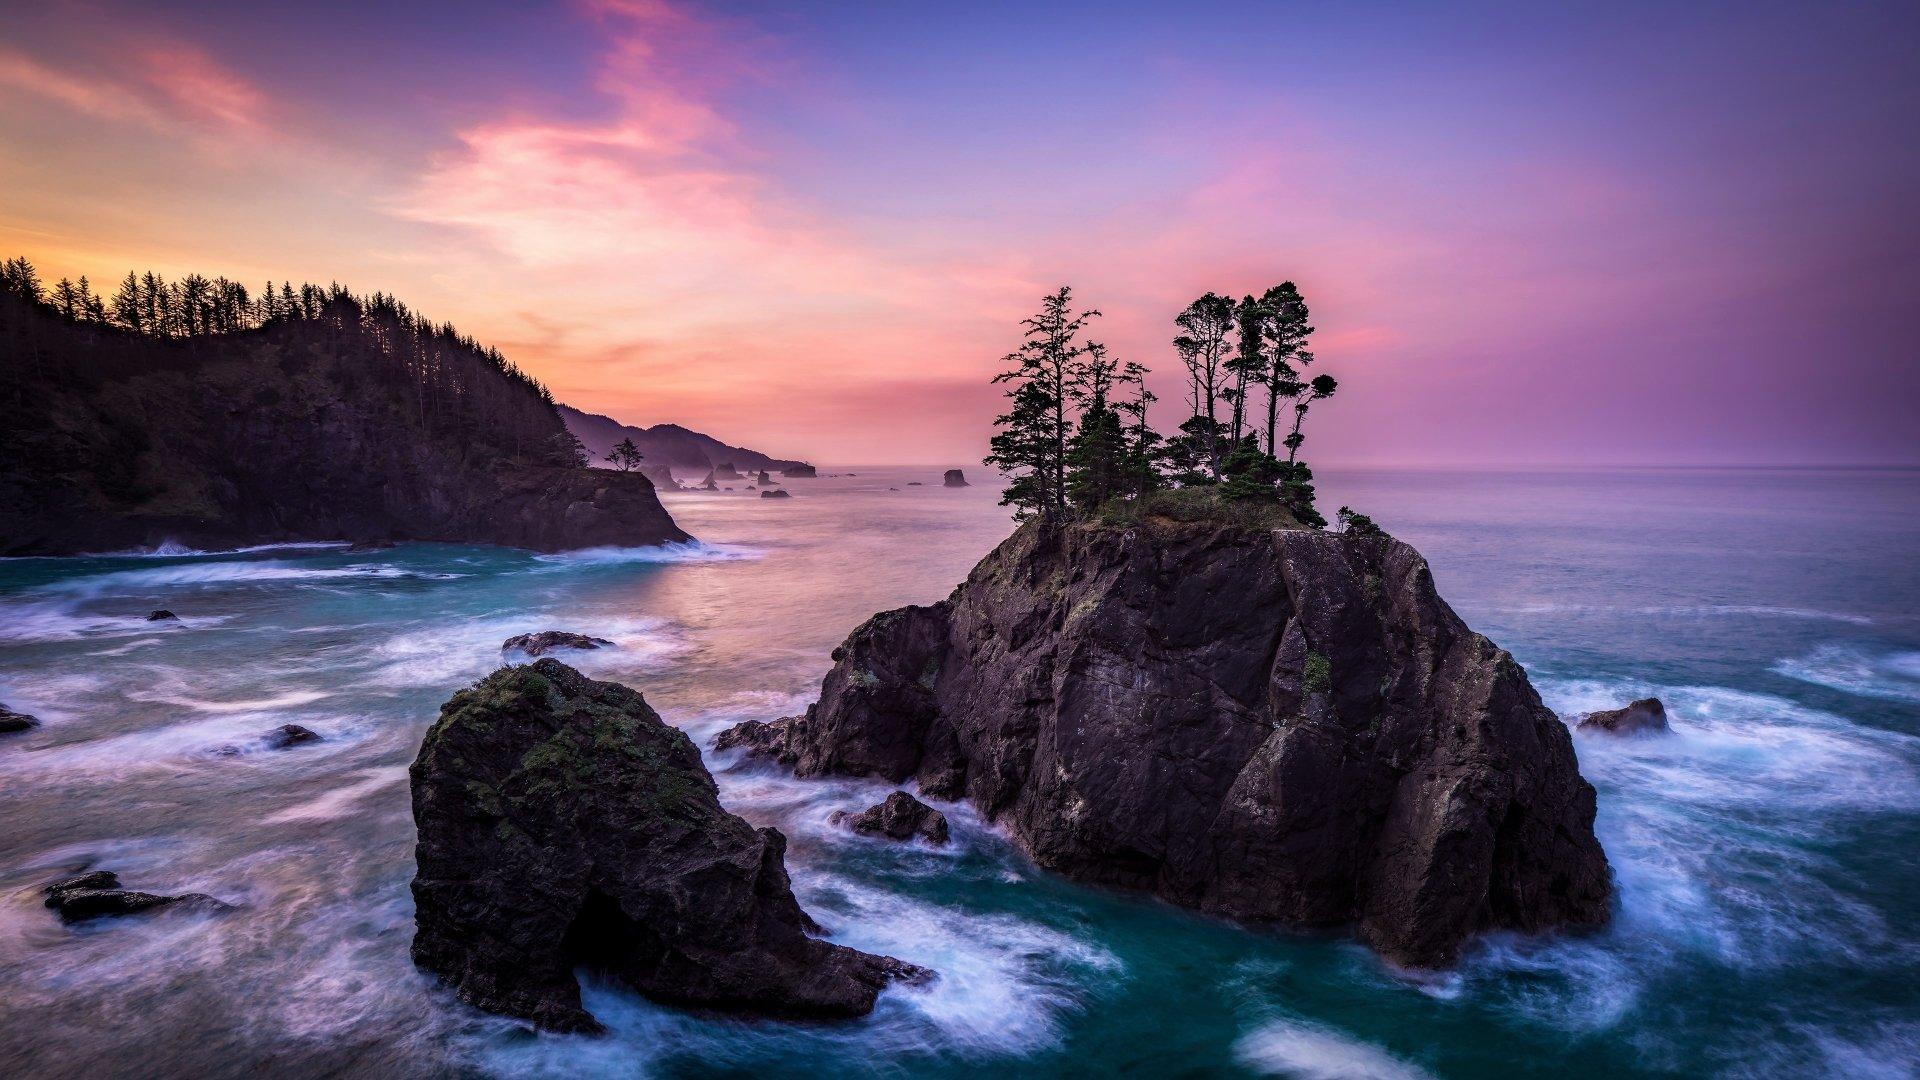 Earth - Ocean  Horizon Earth Sea Rock Tree Sunset Wallpaper